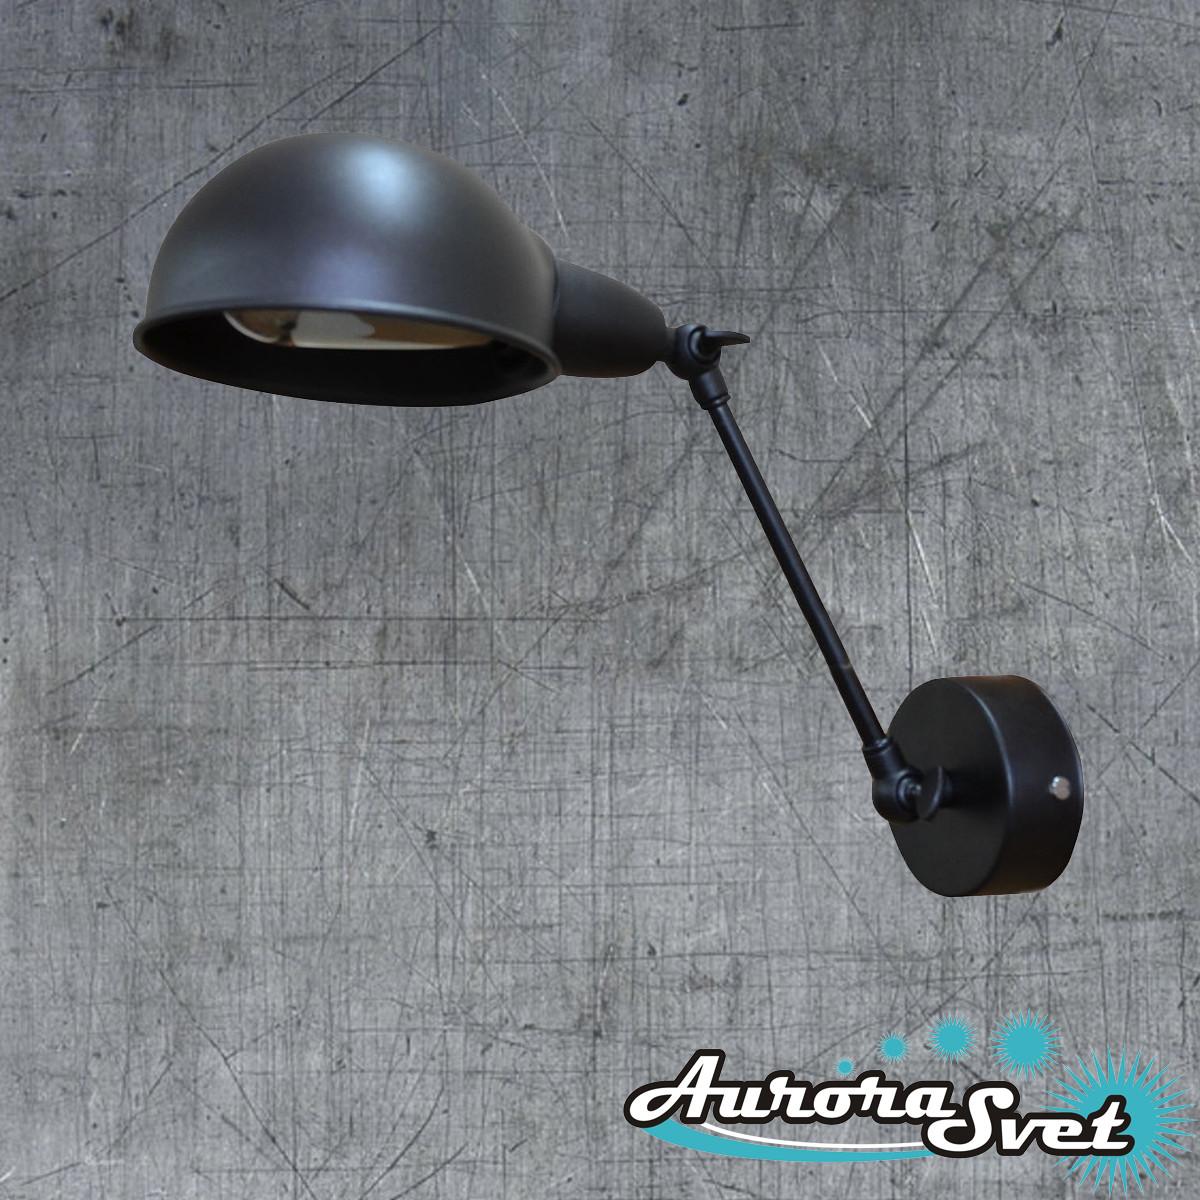 Бра настенная AuroraSvet loft 9600 чёрная.LED светильник бра. Светодиодный светильник бра.